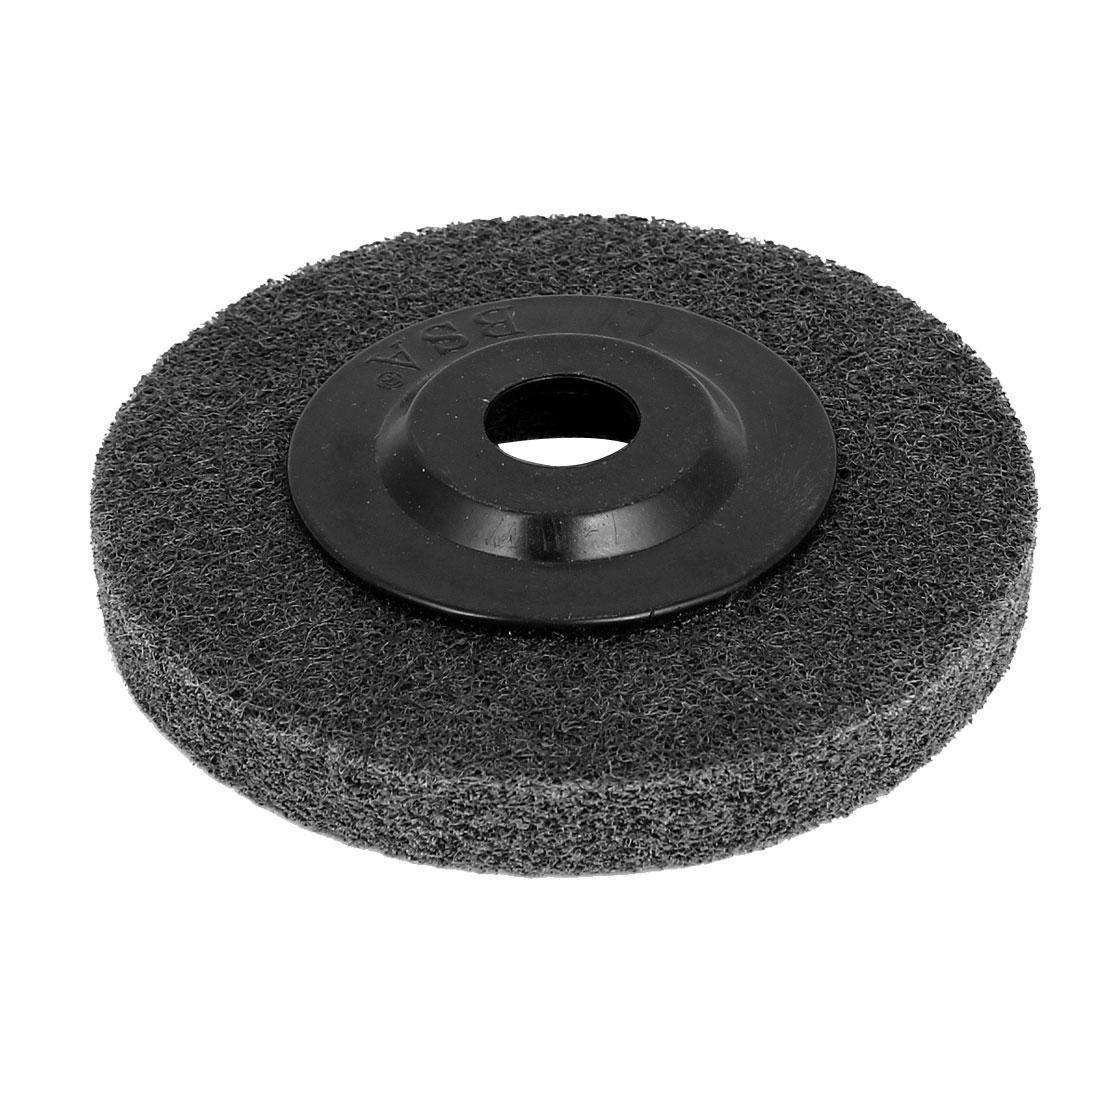 100mmx16mmx12mm Nylon Polishing Grinding Wheel Black for Angle Grinder